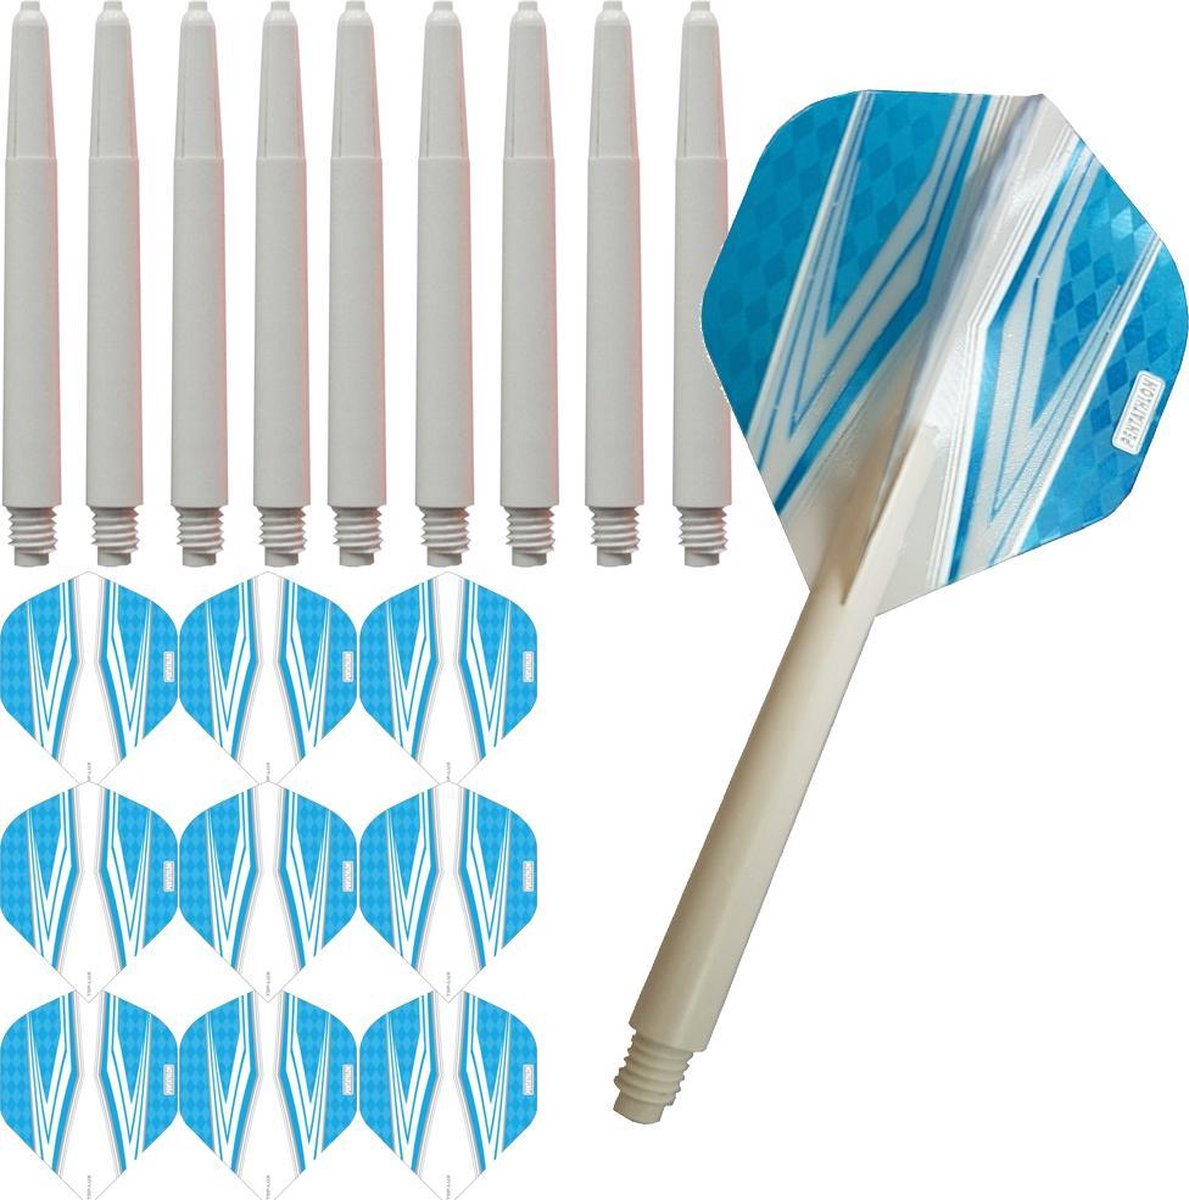 ABC Darts Flights Pentathlon - Dart flights en Medium Dart Shafts - Spitfire wit lichtblauw - 3 sets